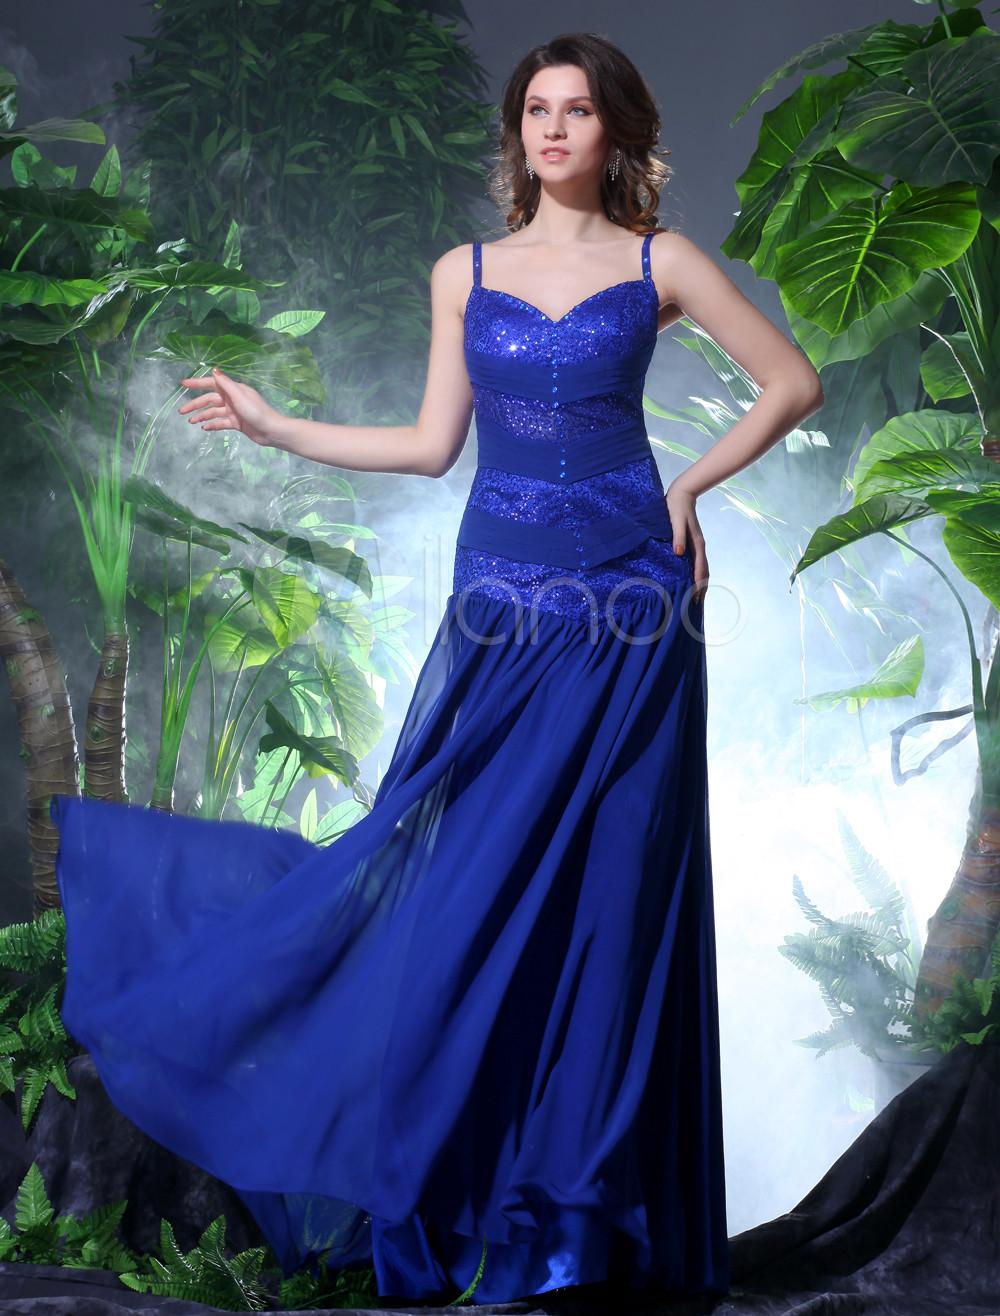 Sheath Royal Blue Straps Neck Sequin Chiffon Prom Dress Milanoo (Wedding Prom Dresses) photo